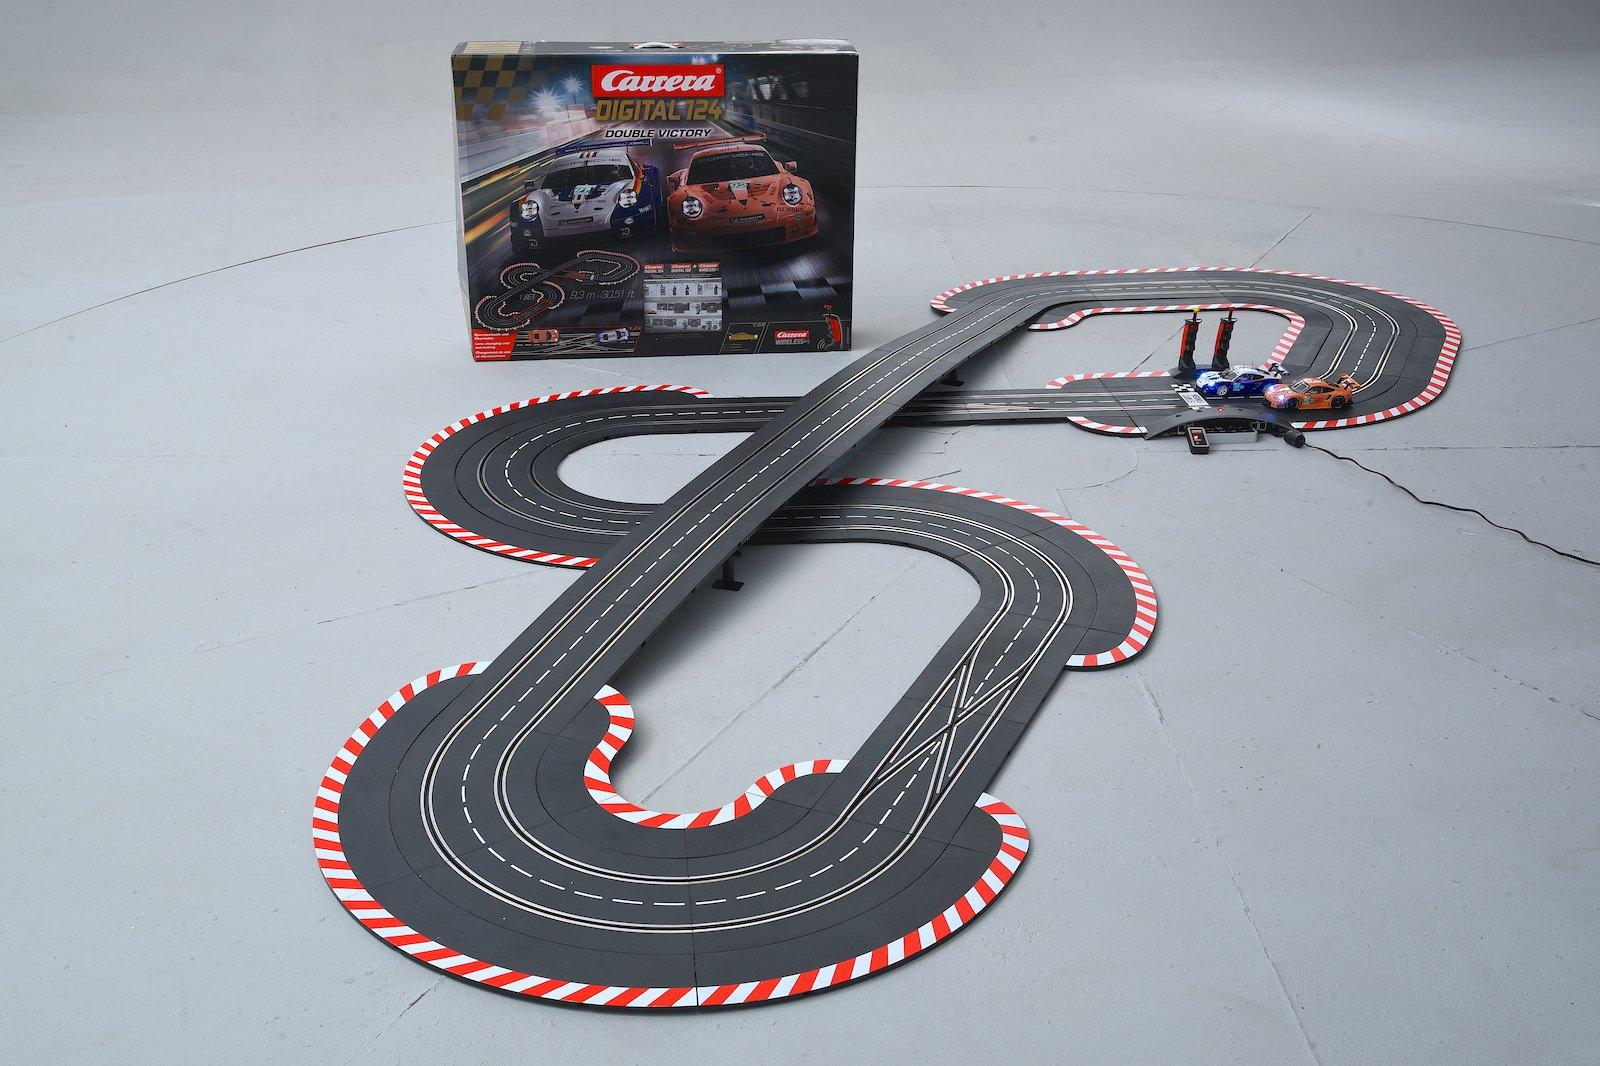 Carrera Double Victory set